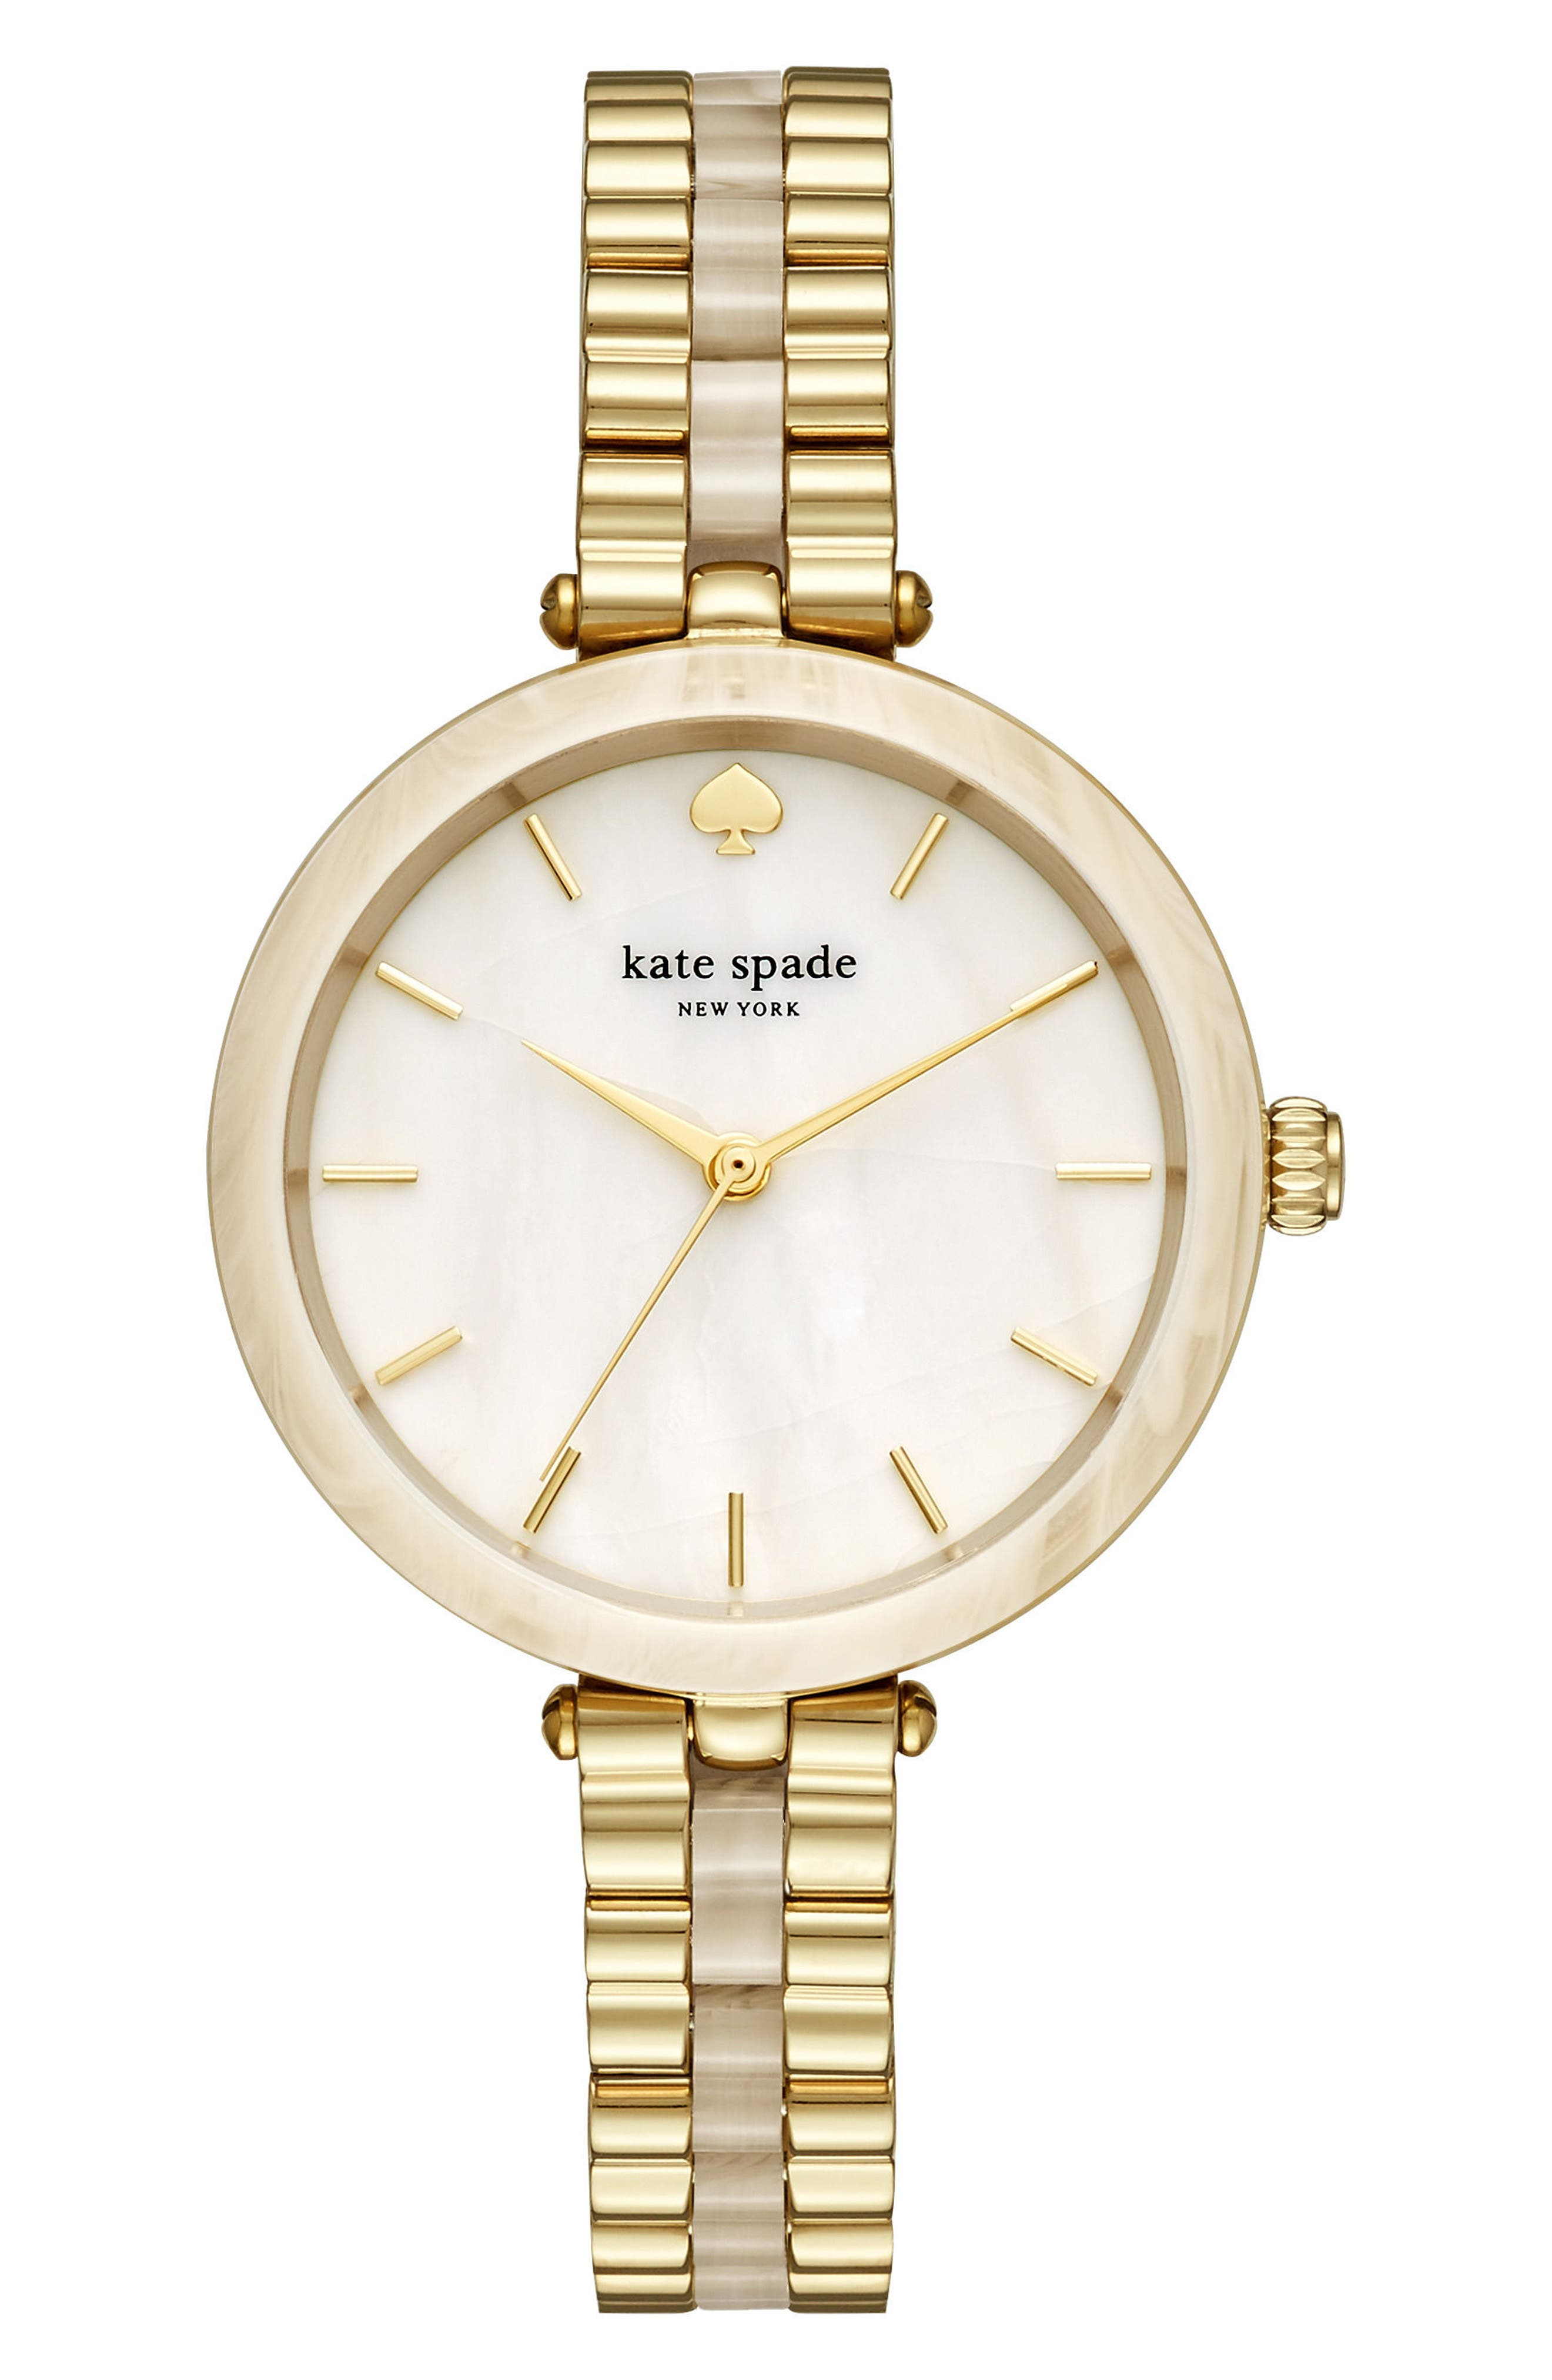 KATE SPADE NEW YORK holland bracelet watch, 34mm